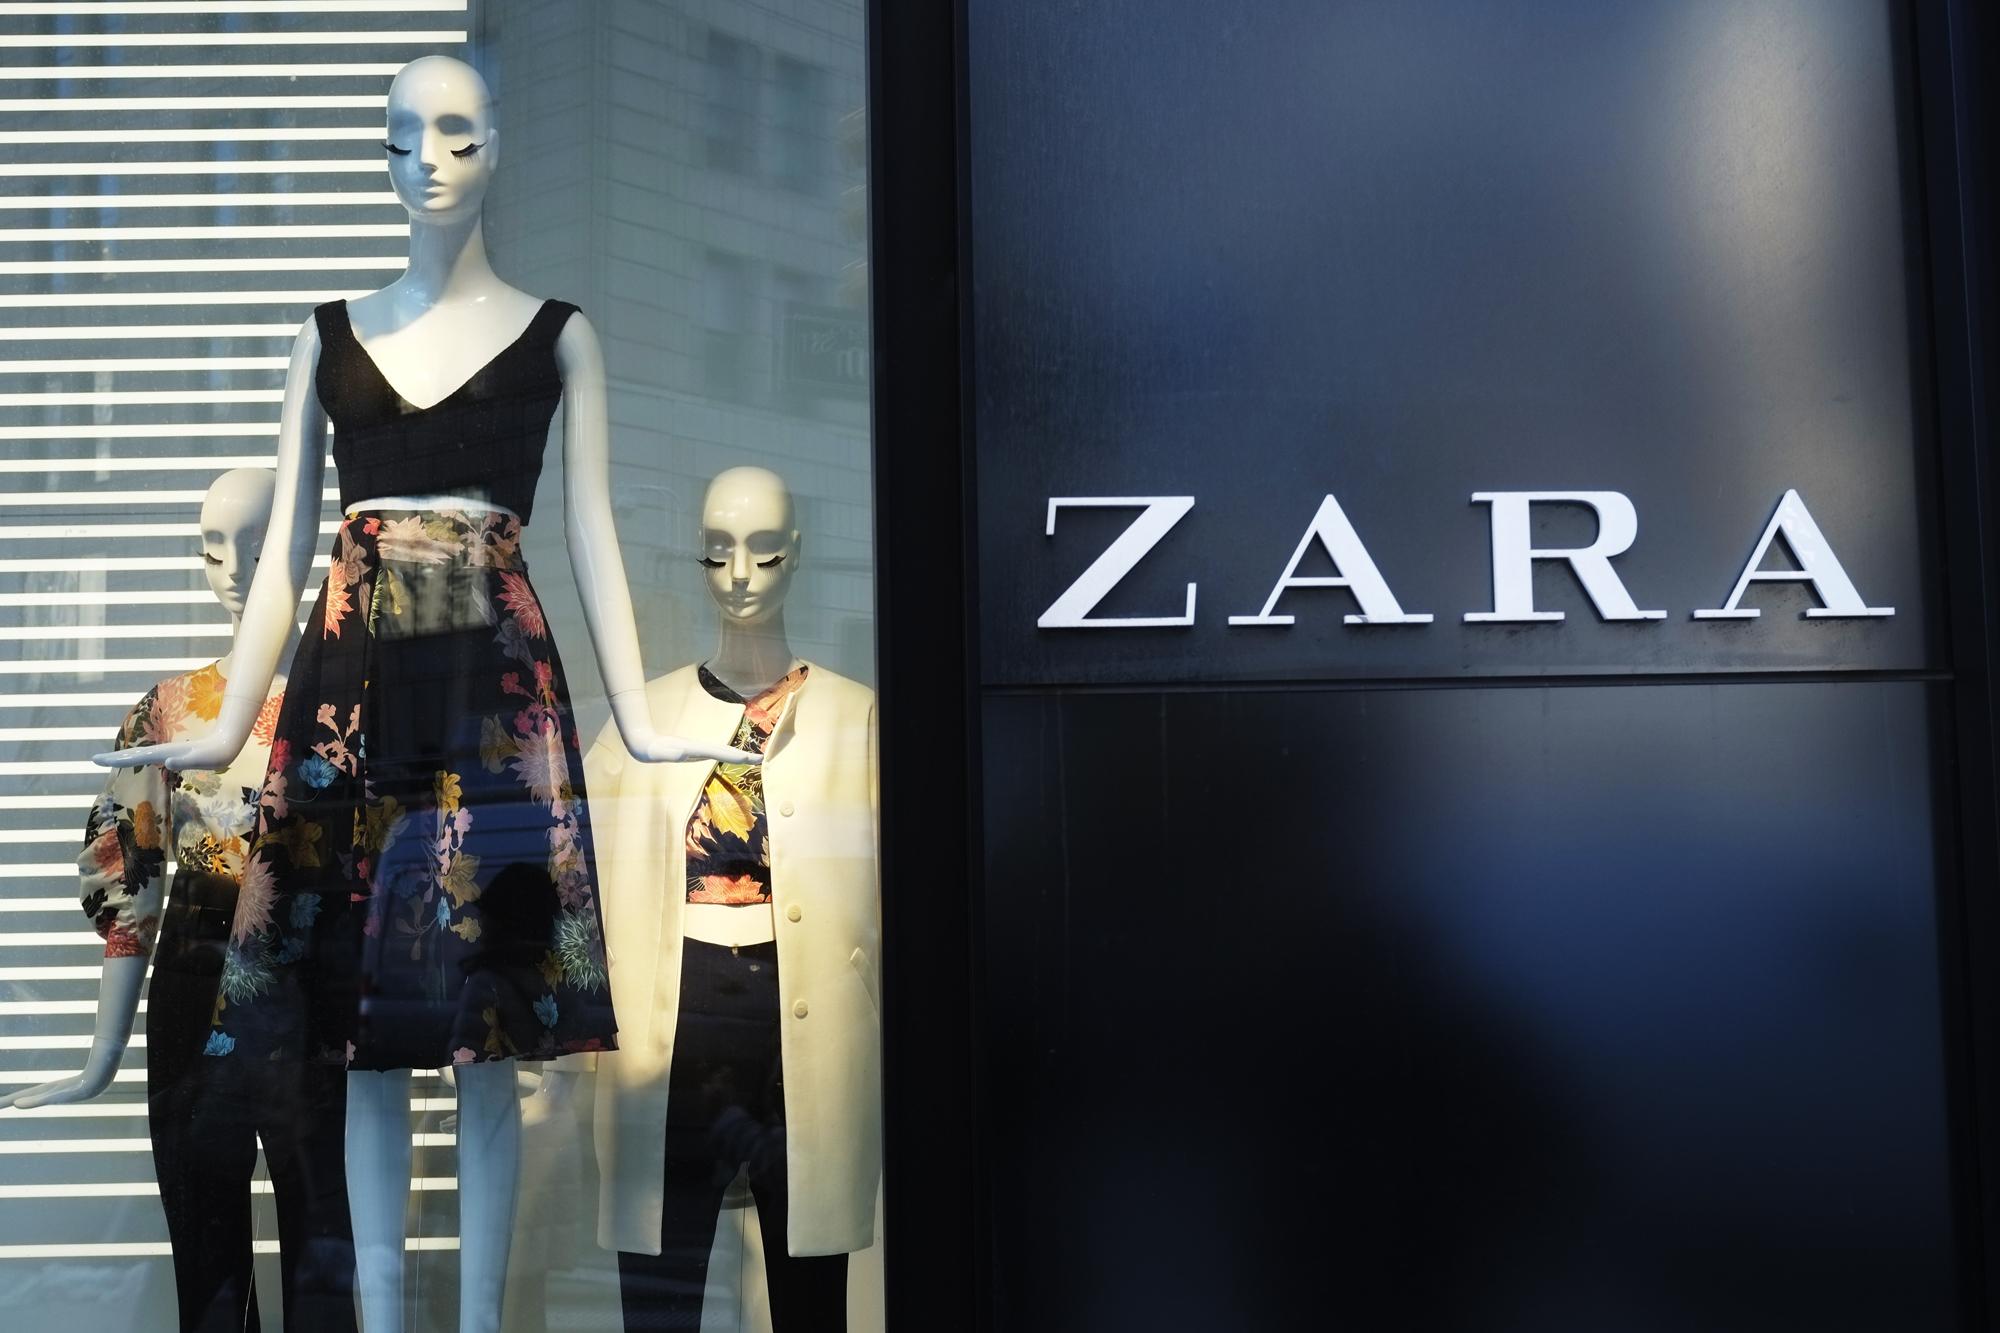 Zara closing stores